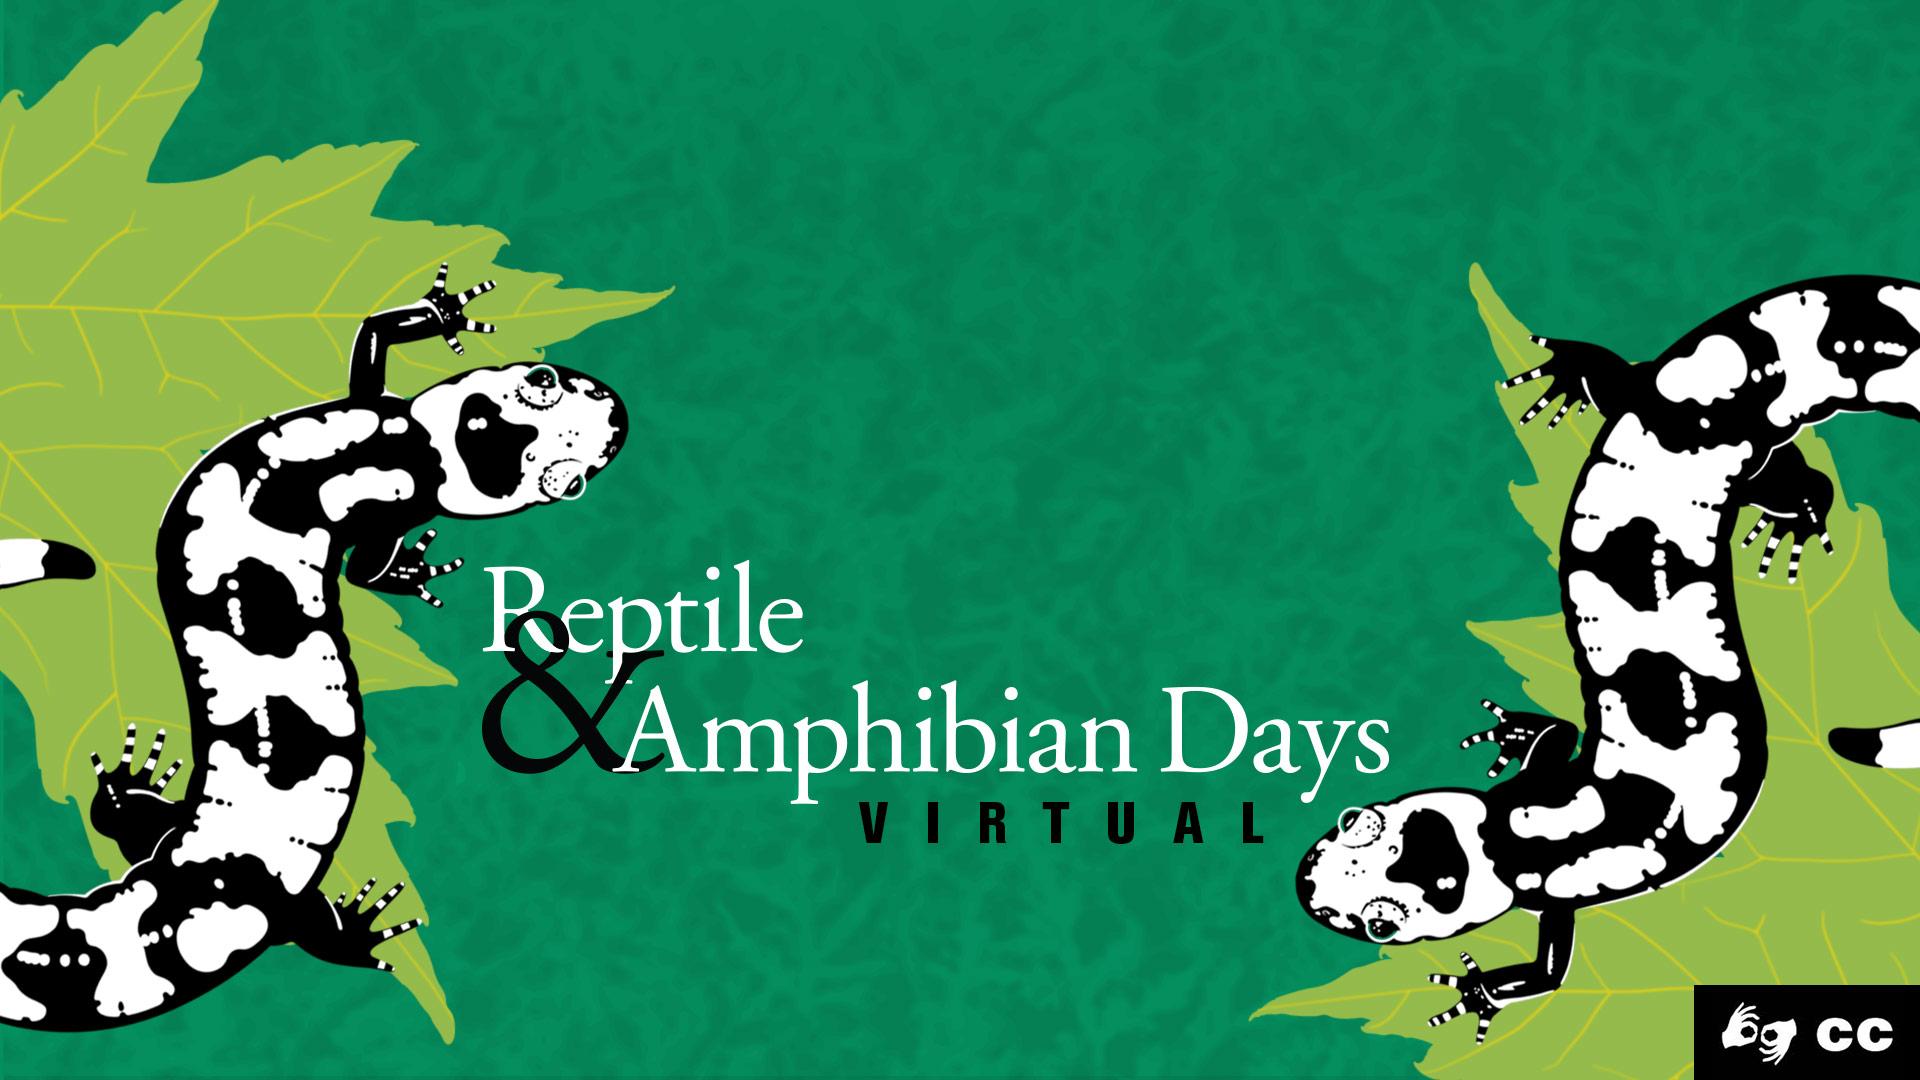 Virtual Reptile and Amphibian Days